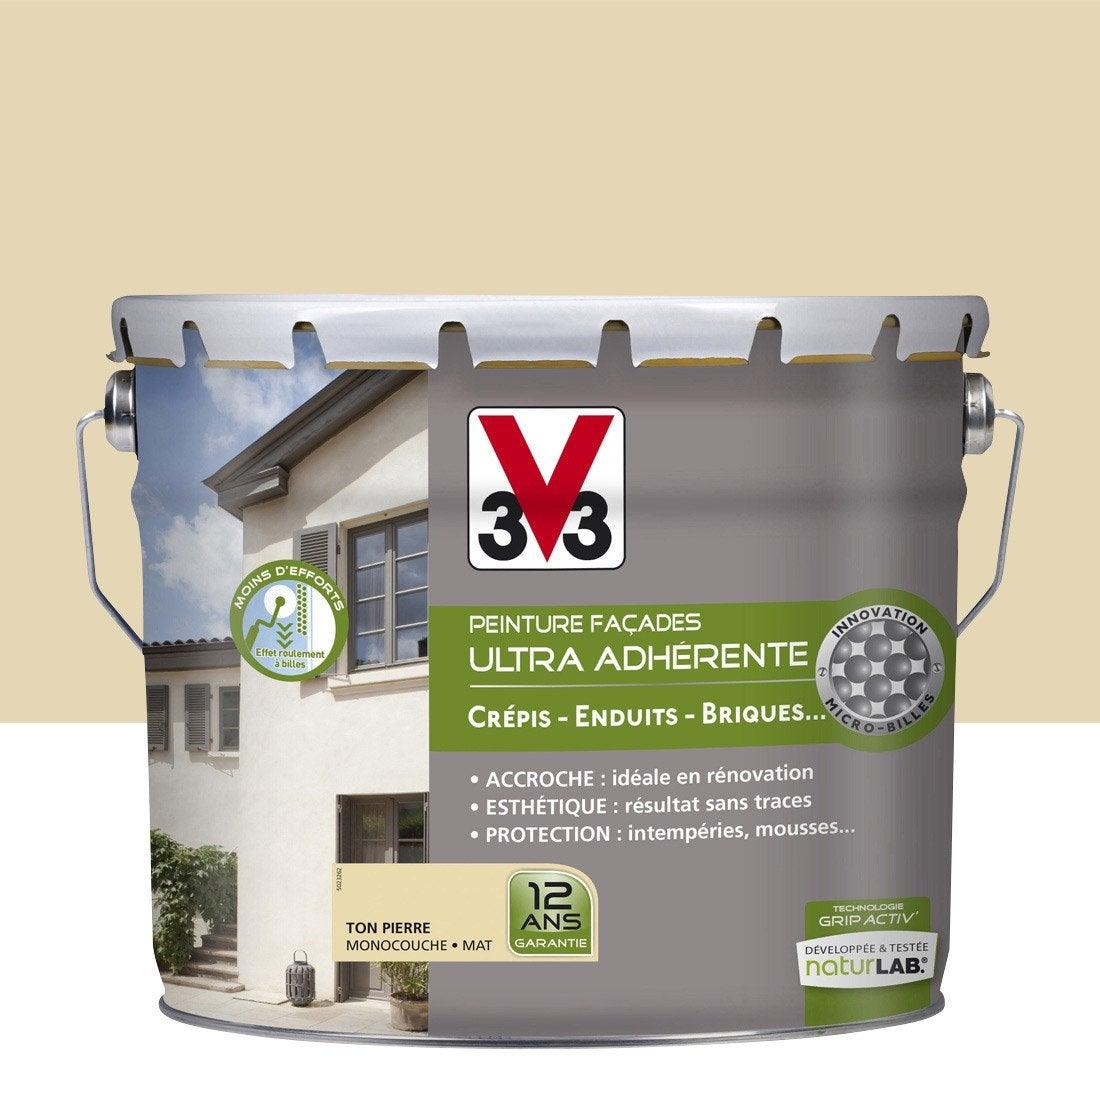 peinture fa ade ultra adh rente v33 ton pierre 10 l. Black Bedroom Furniture Sets. Home Design Ideas